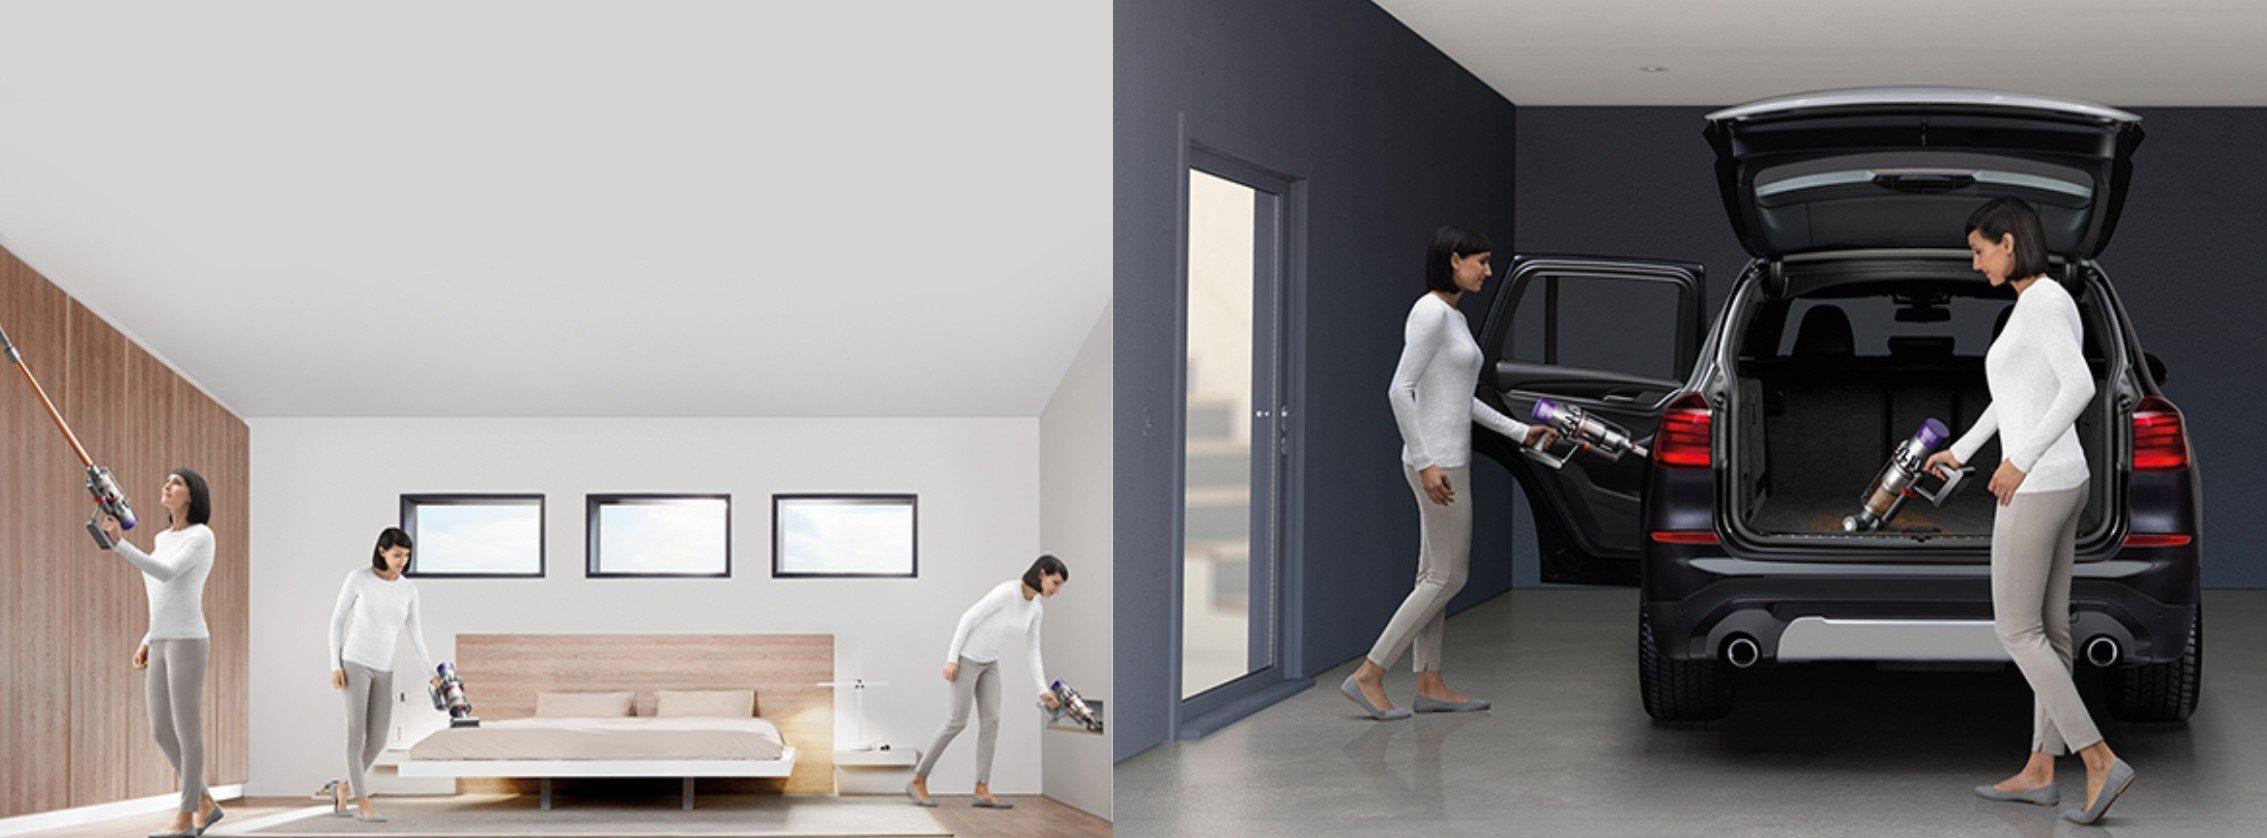 dyson v8 vs v10 vs v11 what 39 s the difference. Black Bedroom Furniture Sets. Home Design Ideas